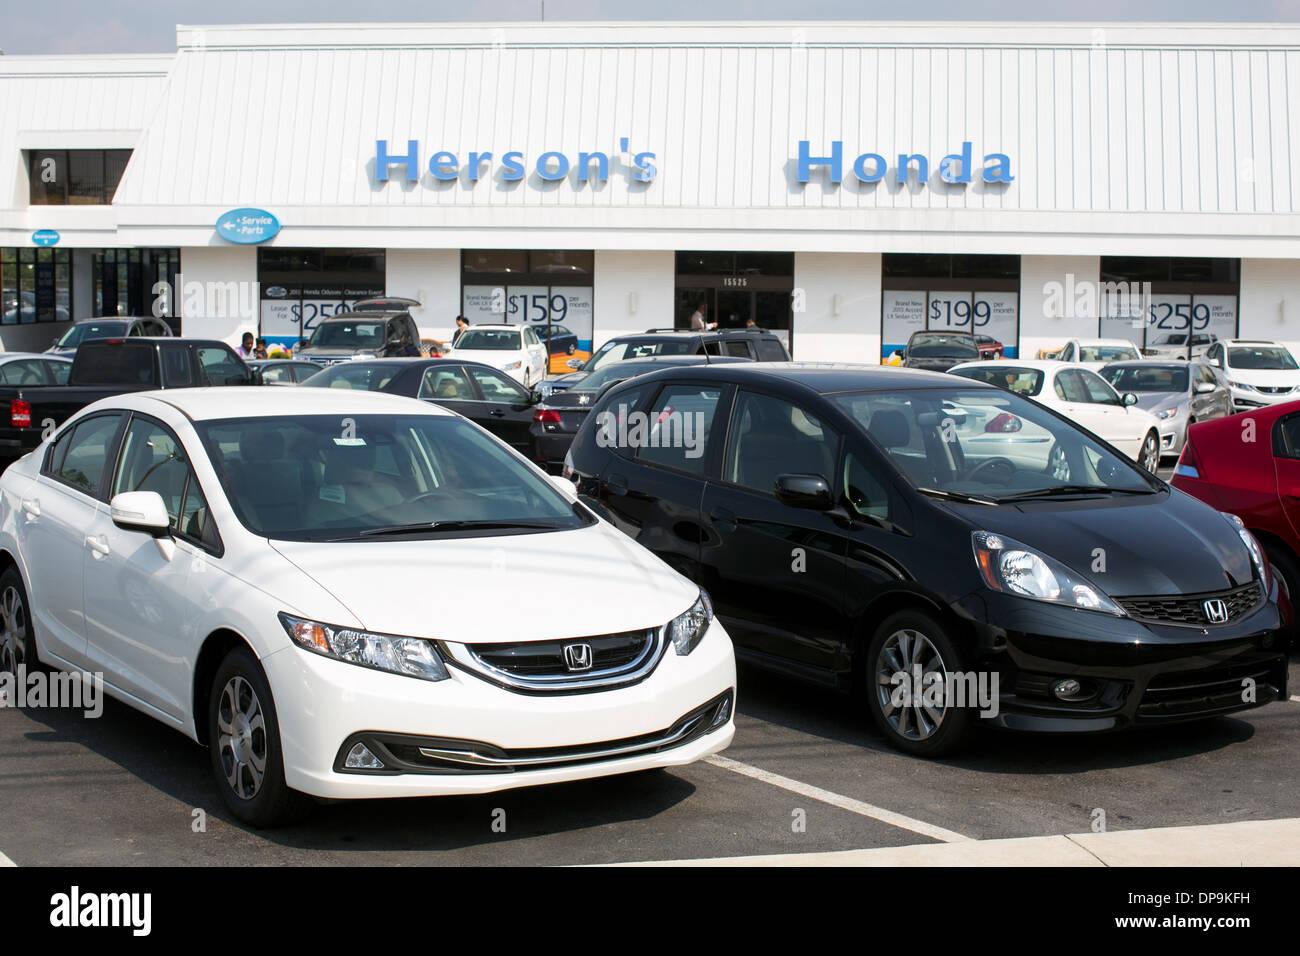 Lovely A Honda Dealer Lot In Suburban Maryland.